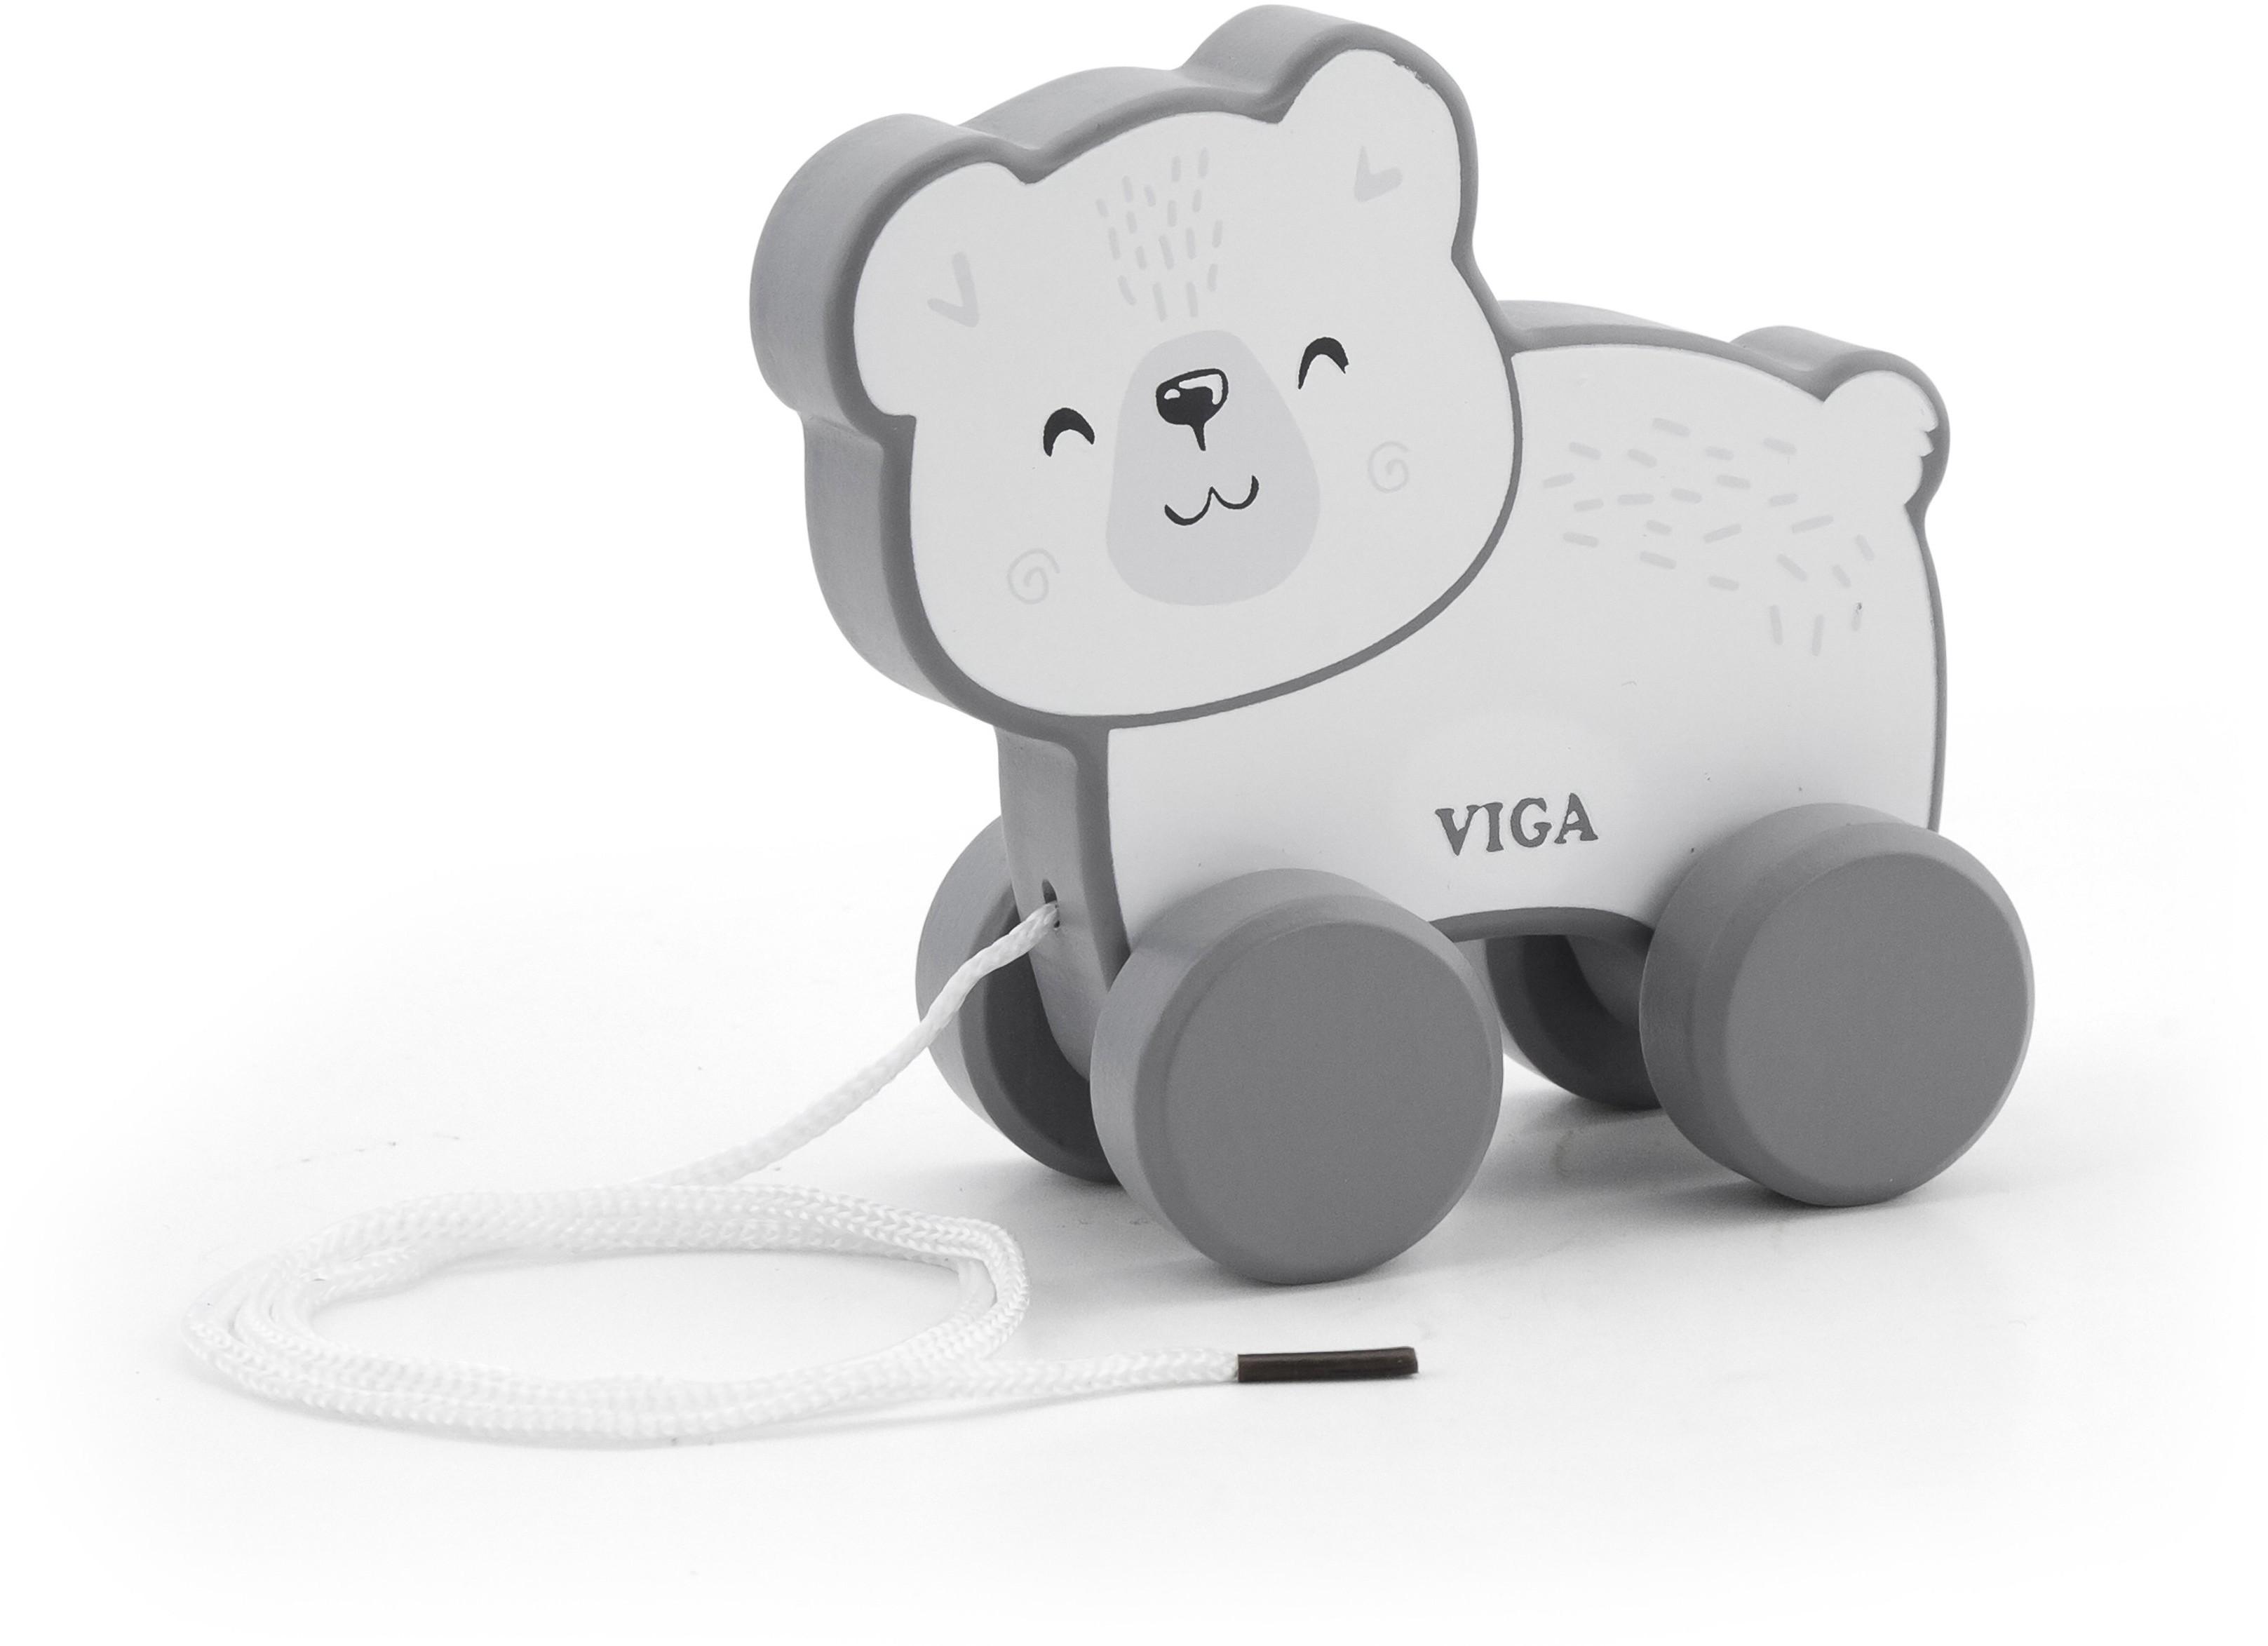 VIGA TOYS Viga Drewniany Miś Polarny do ciągnięcia - PolarB 44001